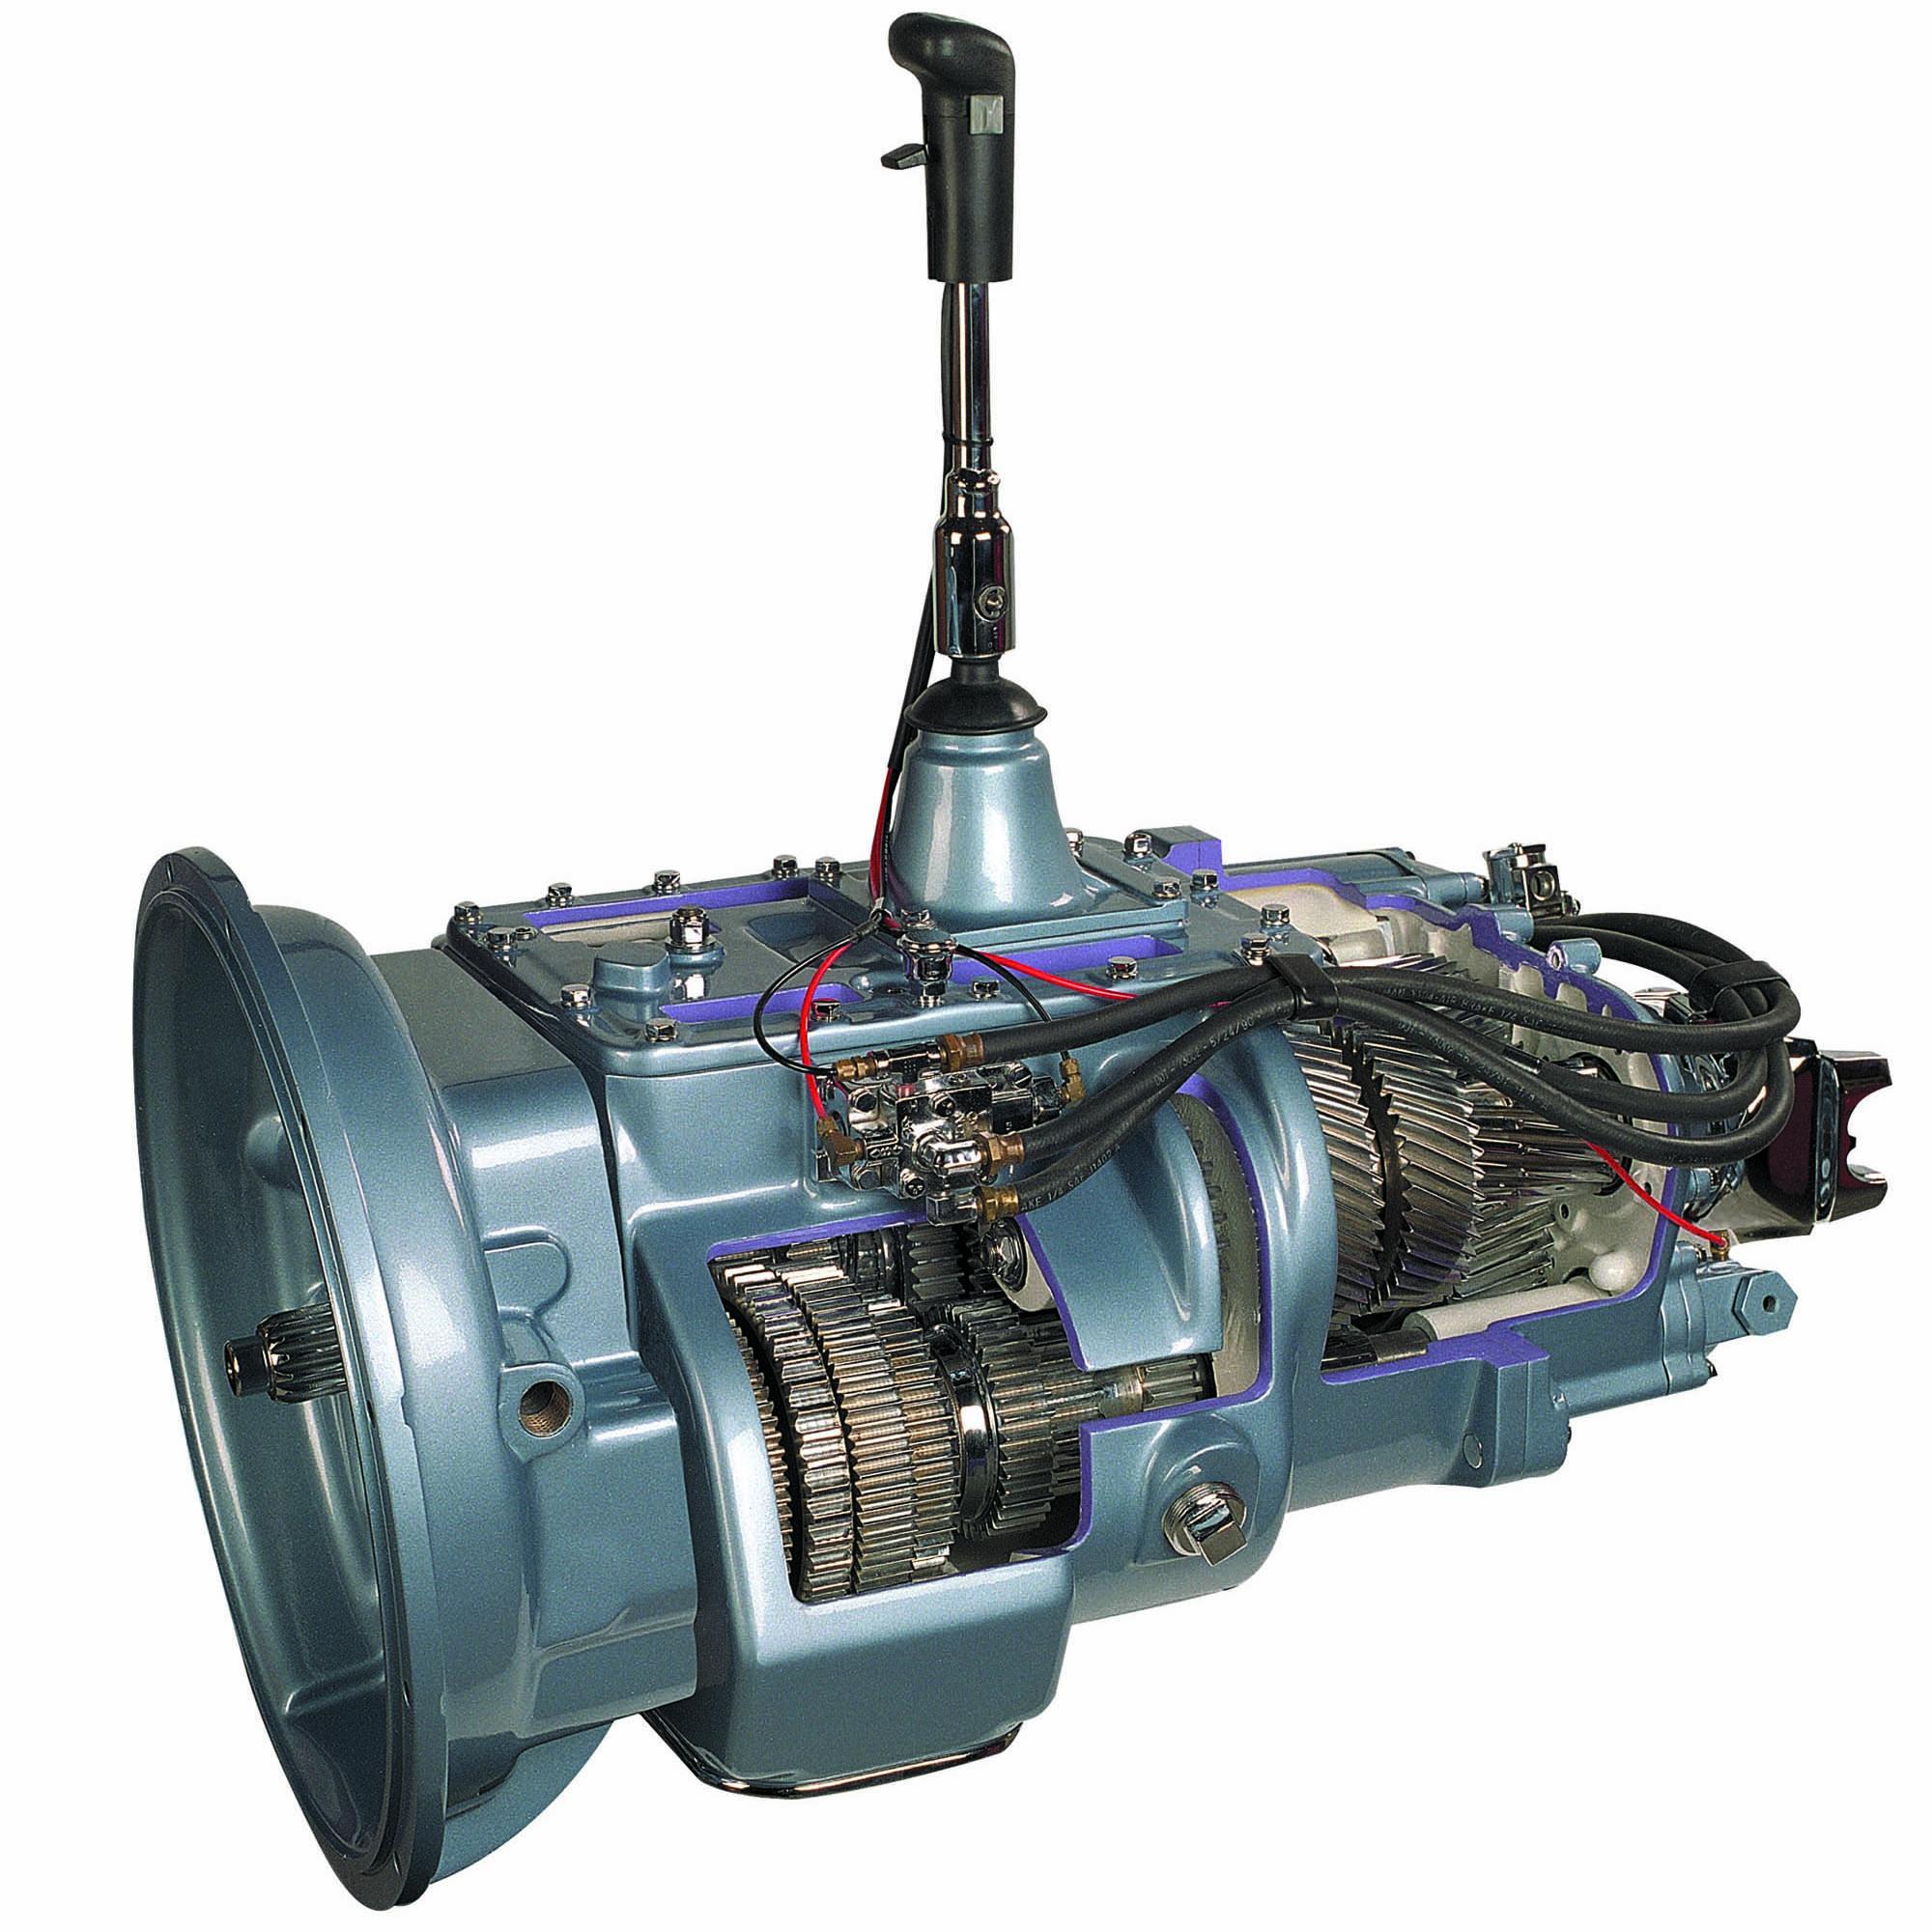 eaton fuller RT-13/rt-18 manual transmission